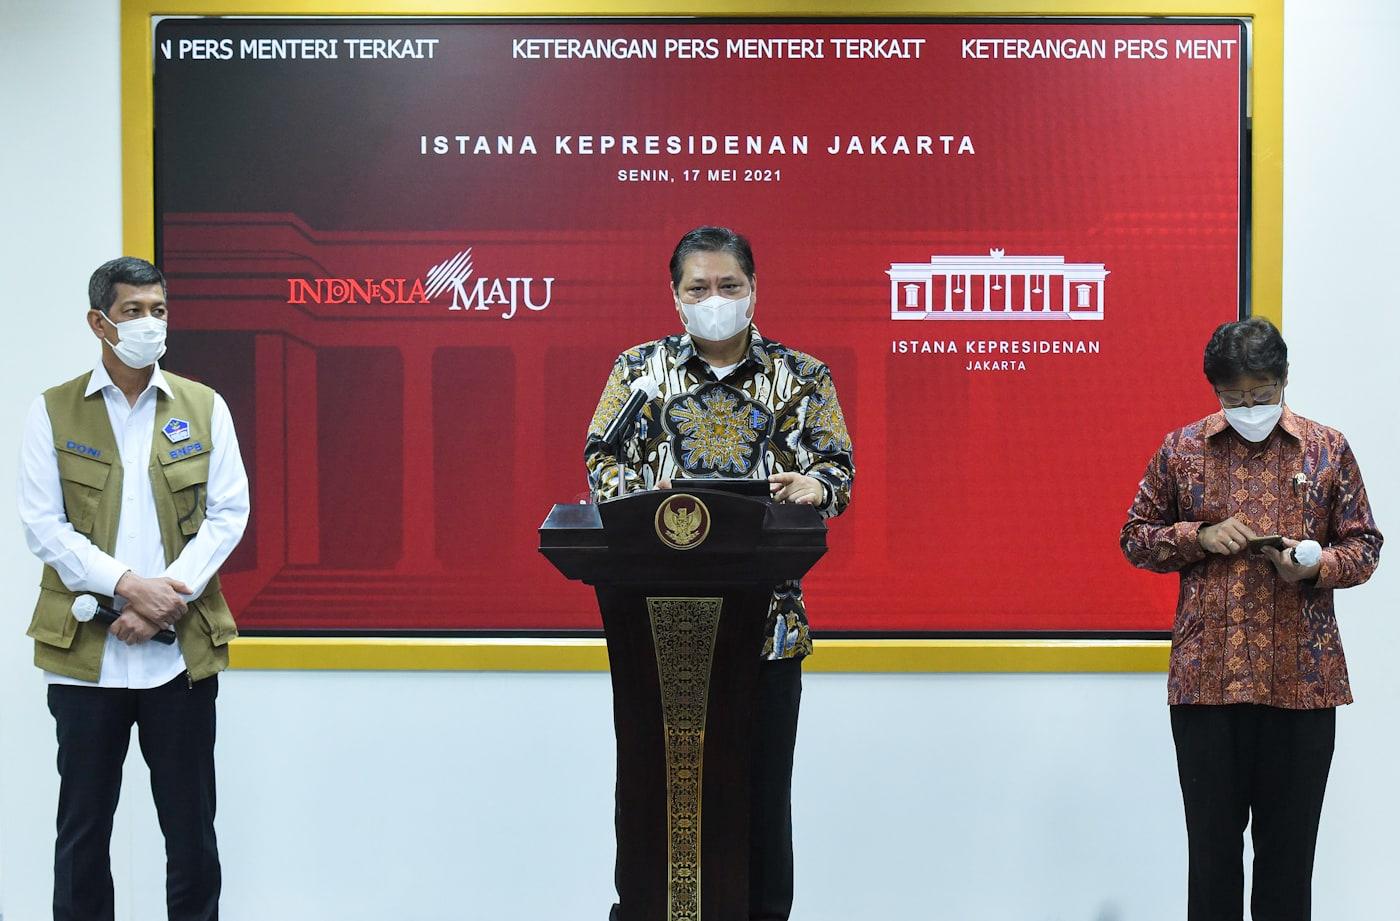 Ketua KPCPEN Airlangga Hartarto didampingi Menkes Budi Gunadi Sadikin dan Ketua Satgas Penanganan COVID-19 Doni Monardo